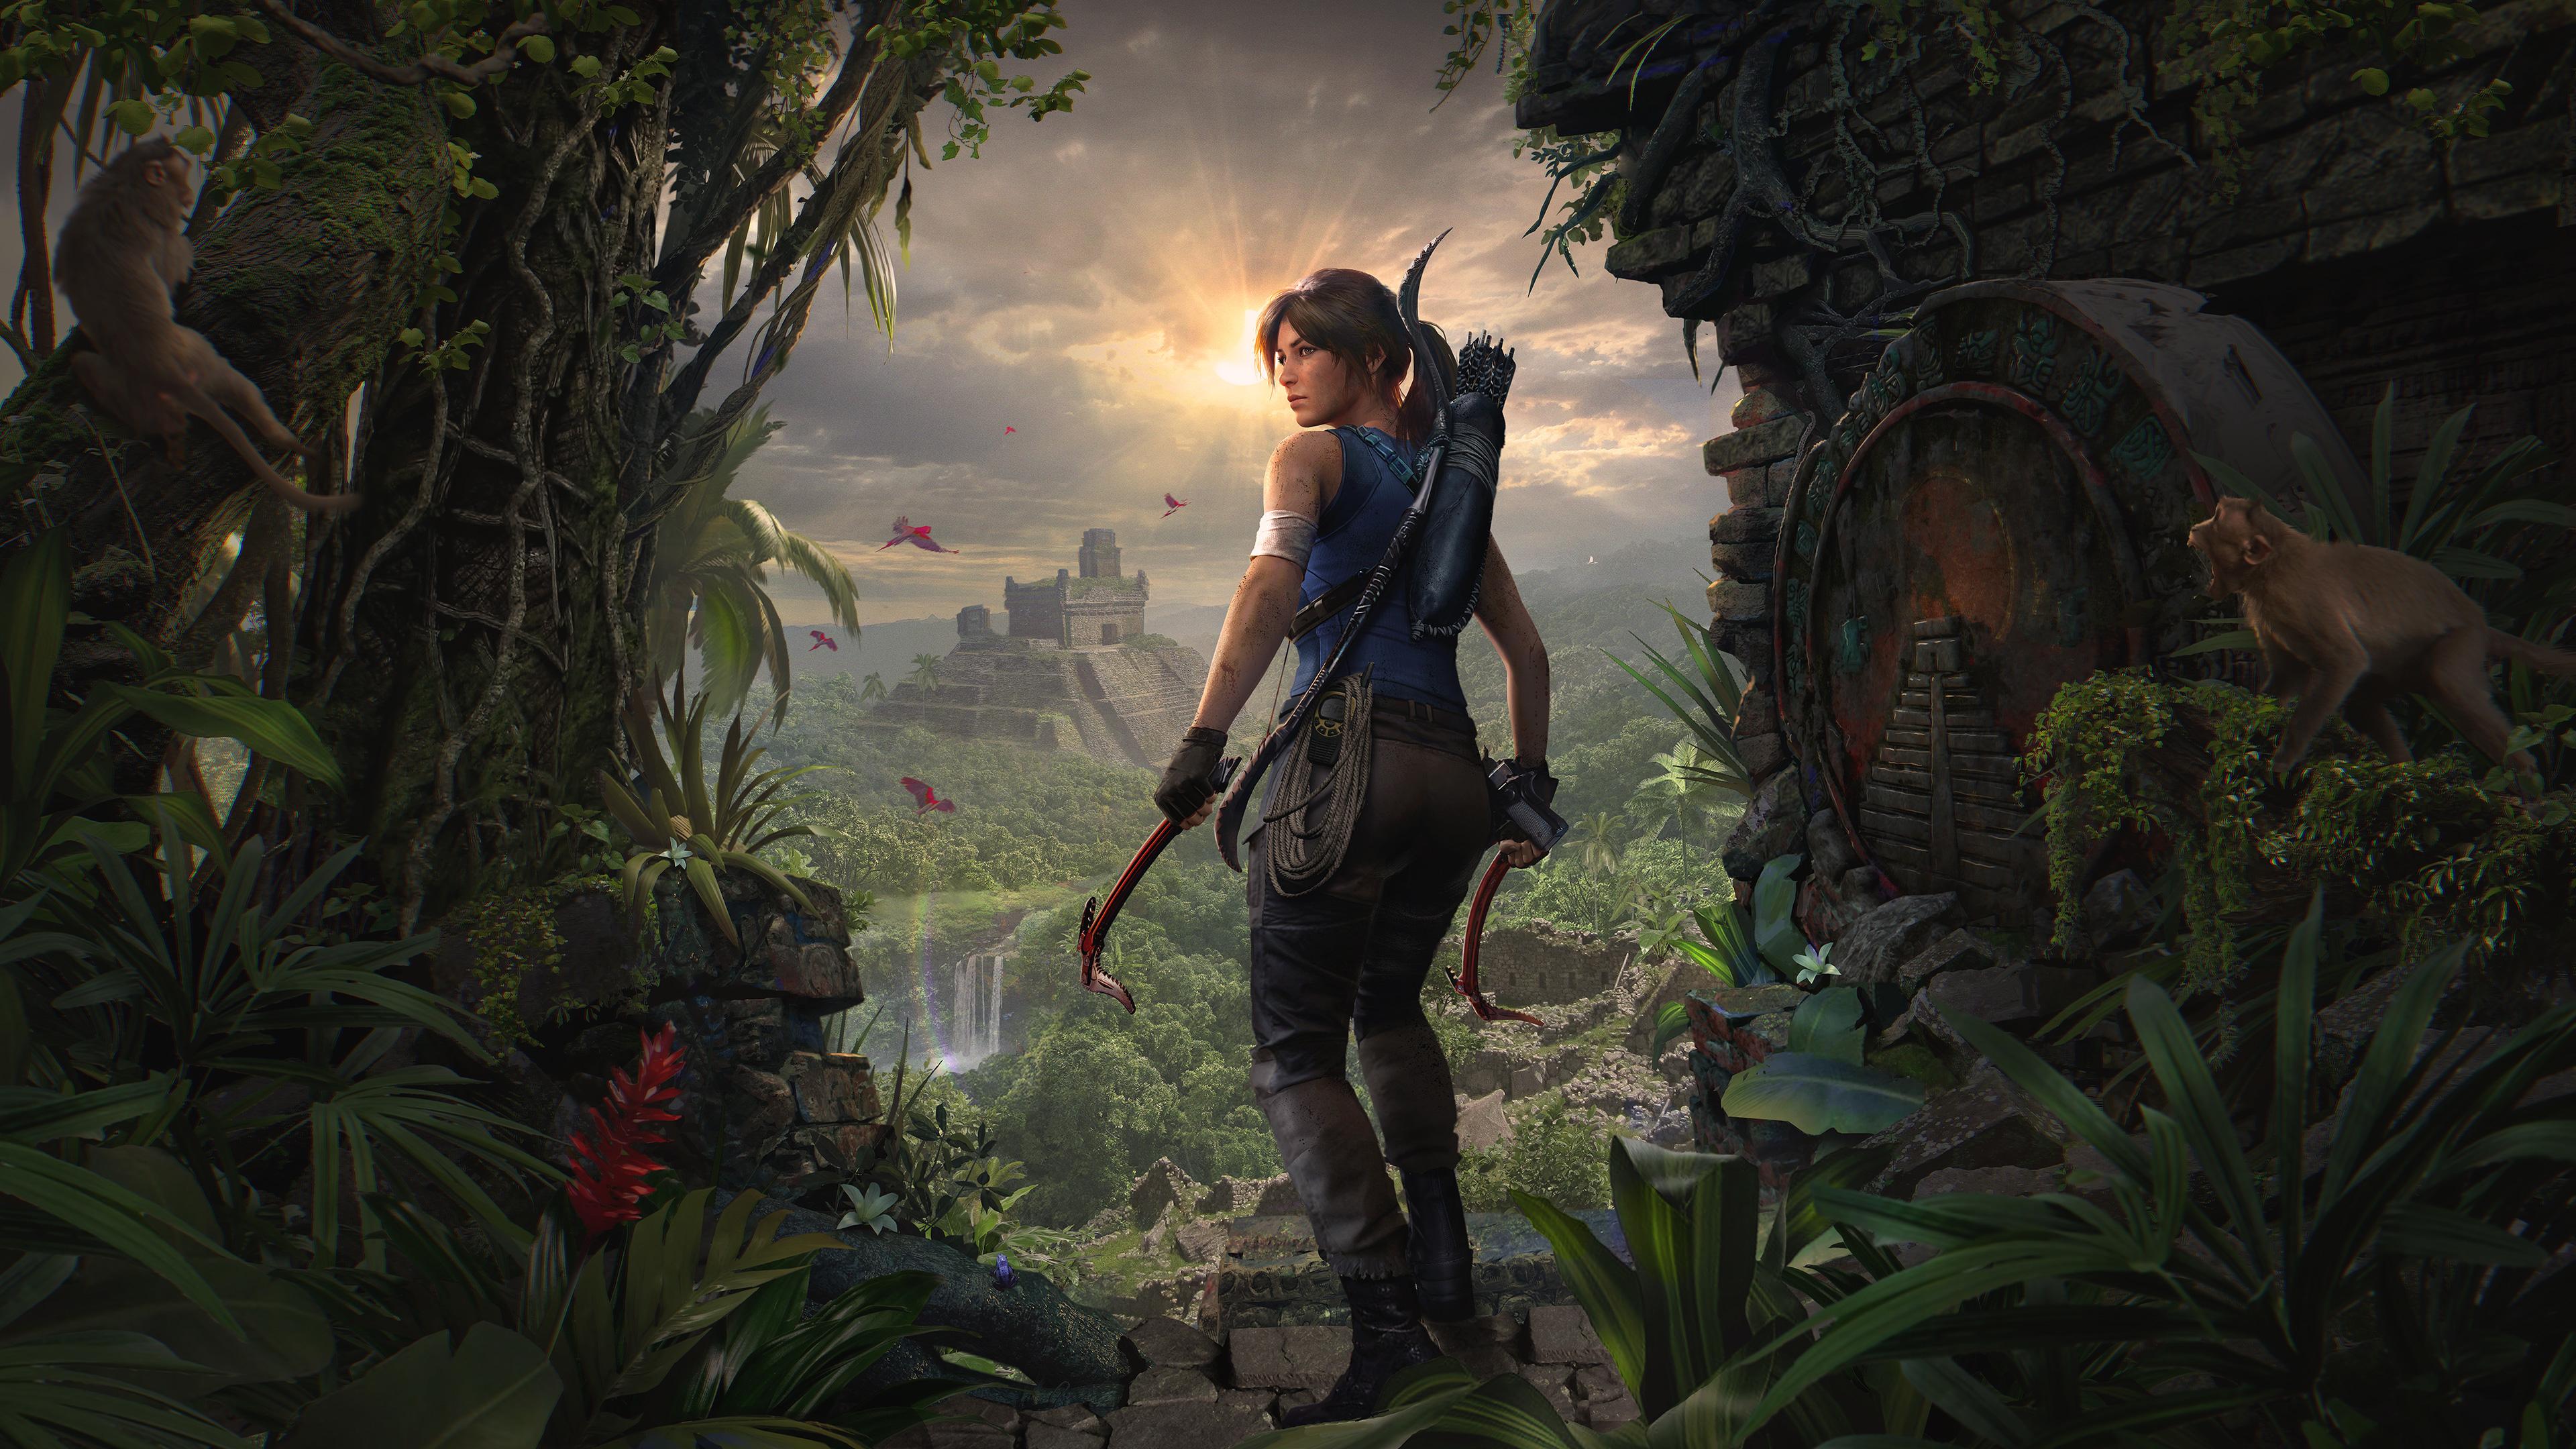 Wallpaper Lara Croft Shadow Of The Tomb Raider Tomb